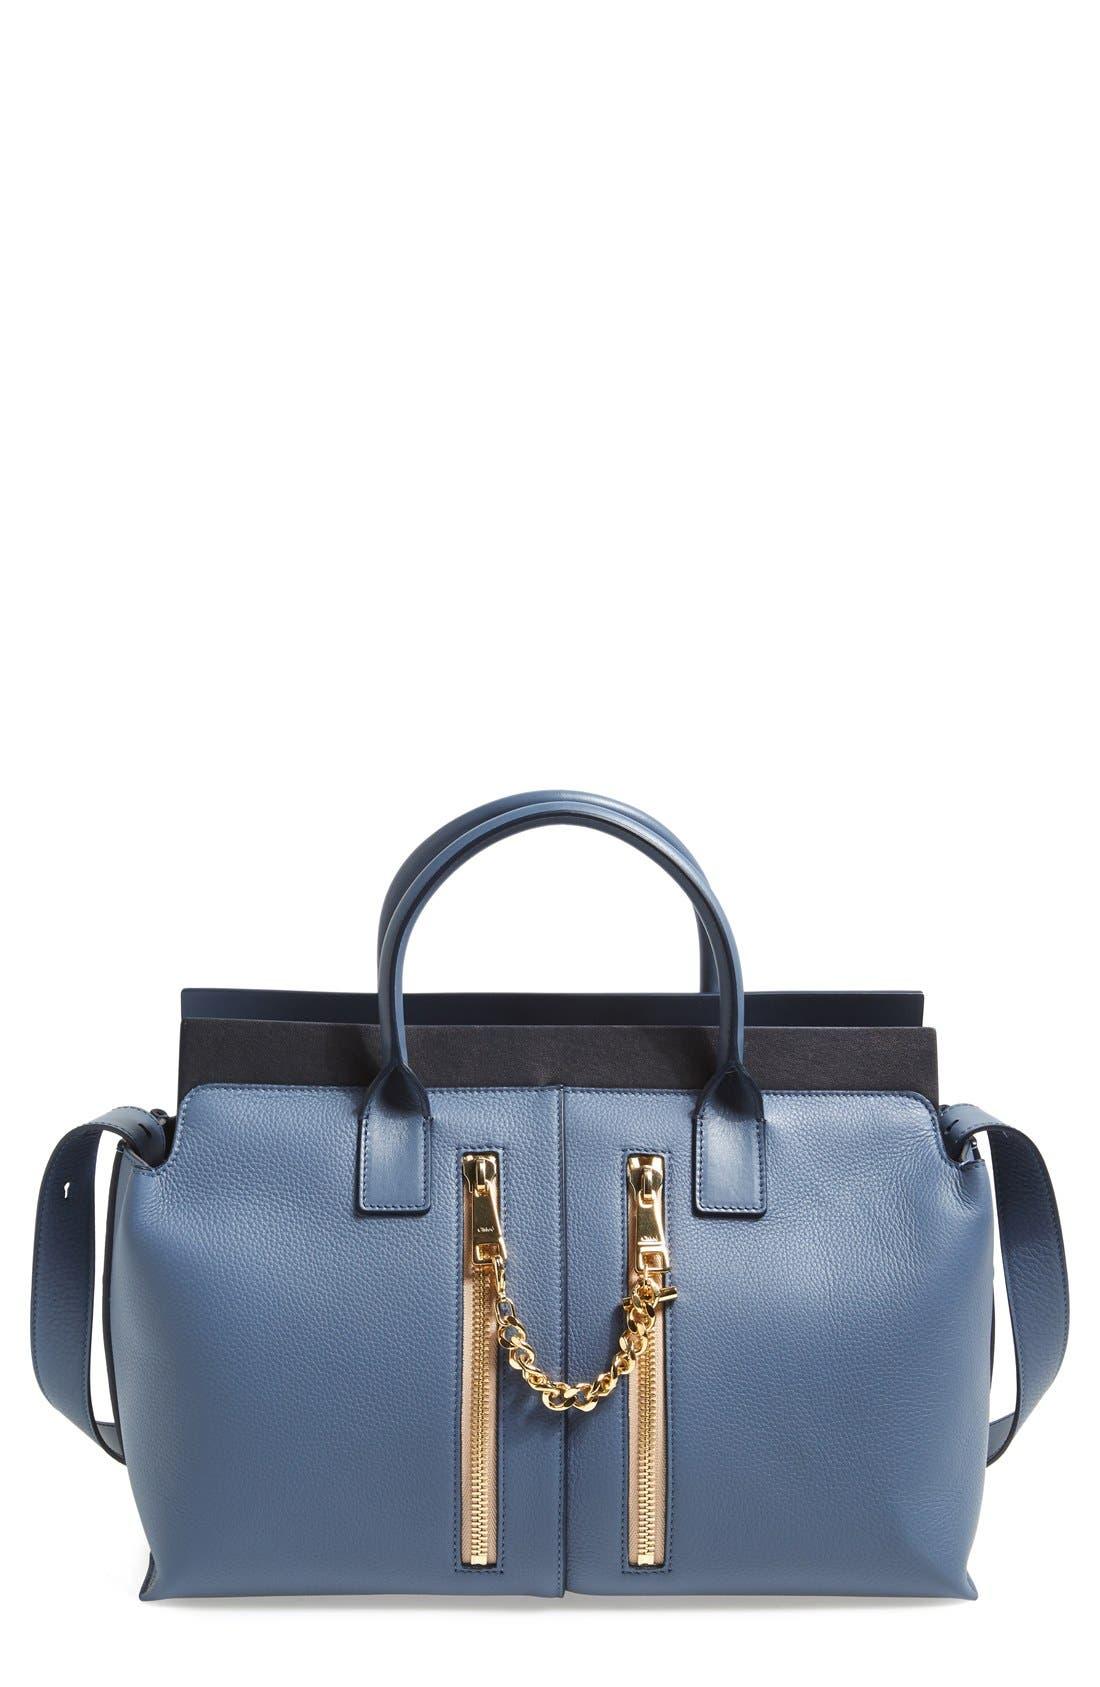 Main Image - Chloé 'Cate - Medium' Leather Satchel